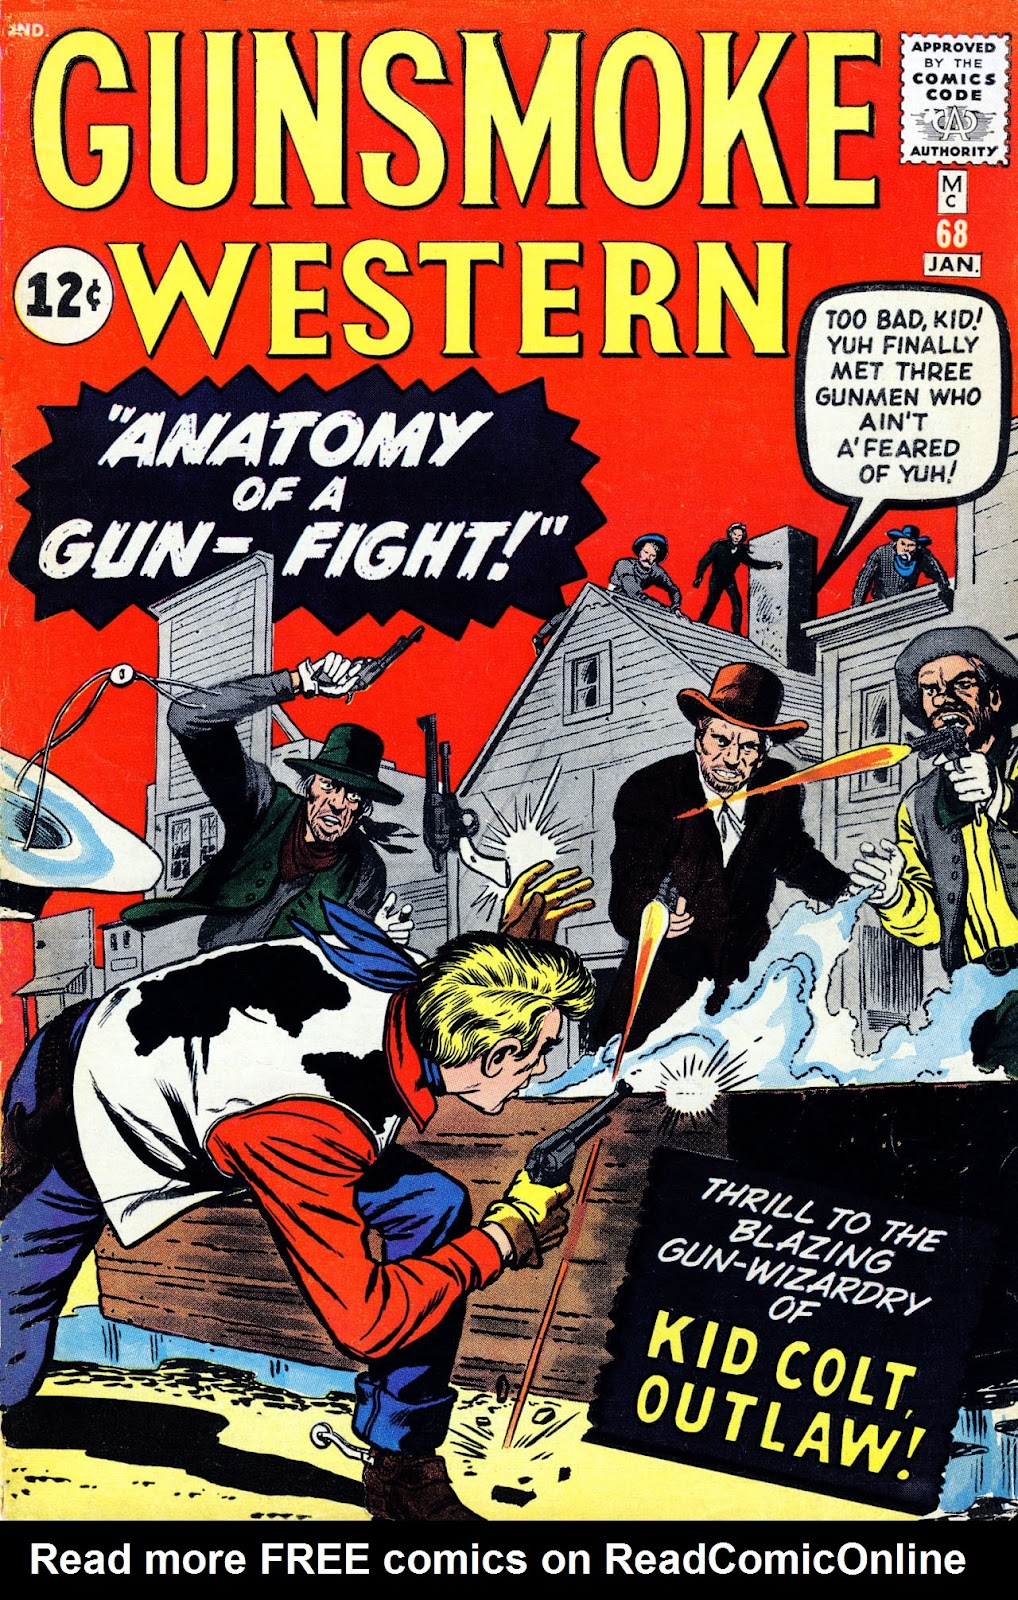 Gunsmoke Western issue 68 - Page 1